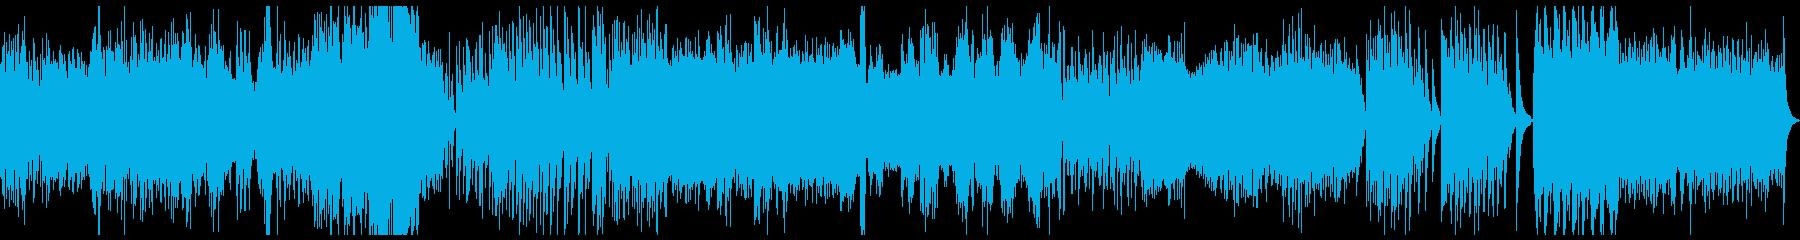 Ravel ラヴェル 水の戯れの再生済みの波形